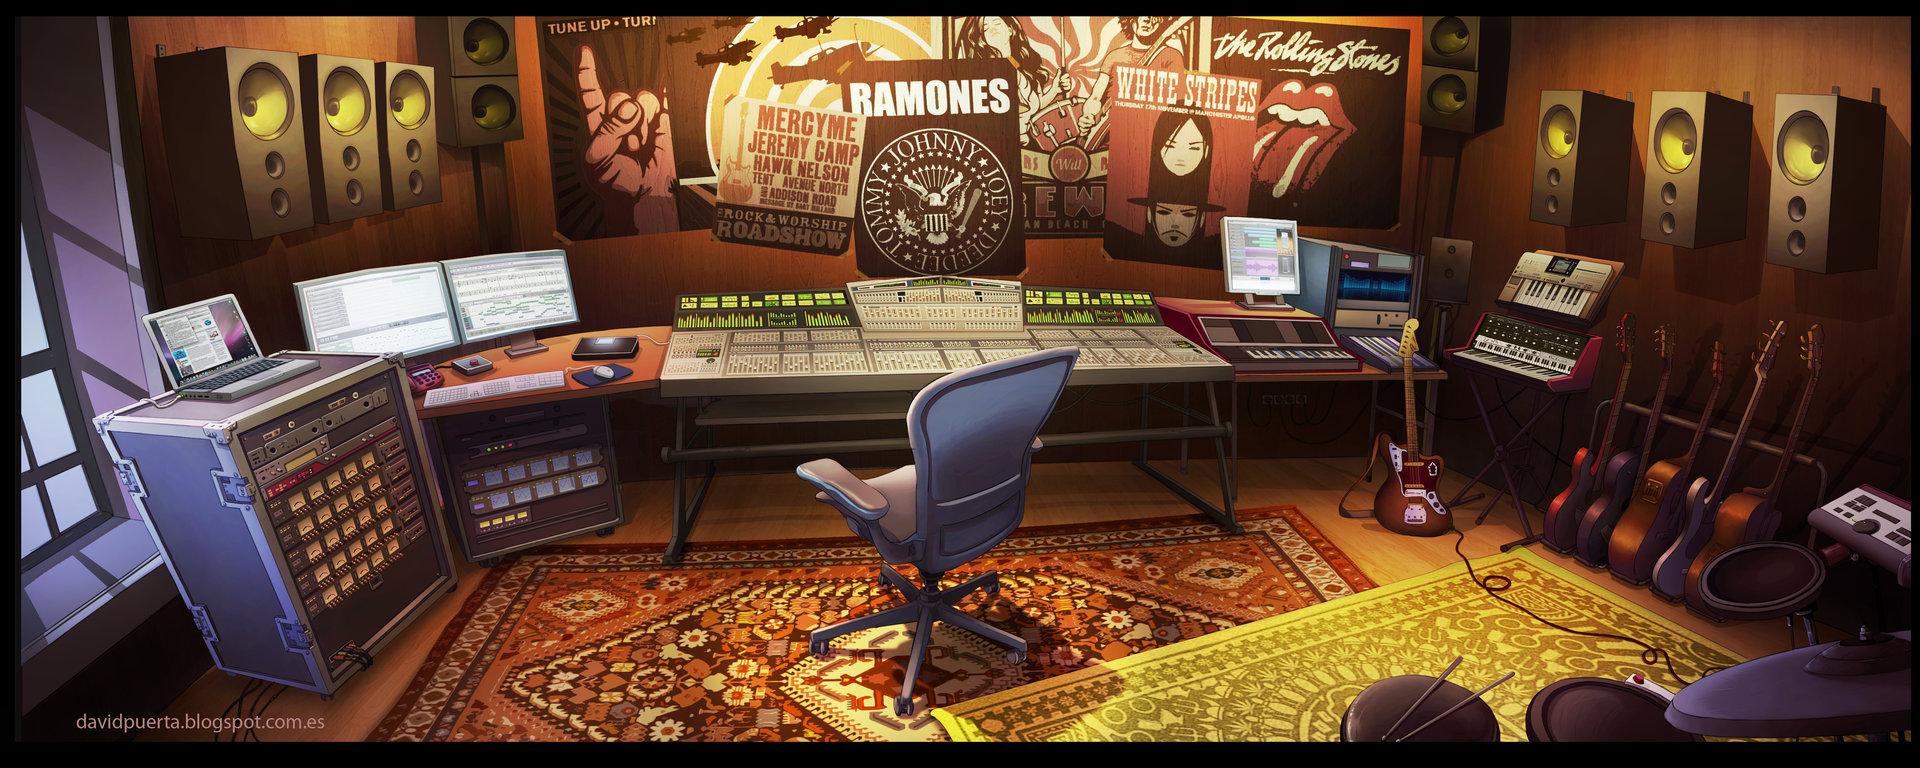 David puerta altes studio2222